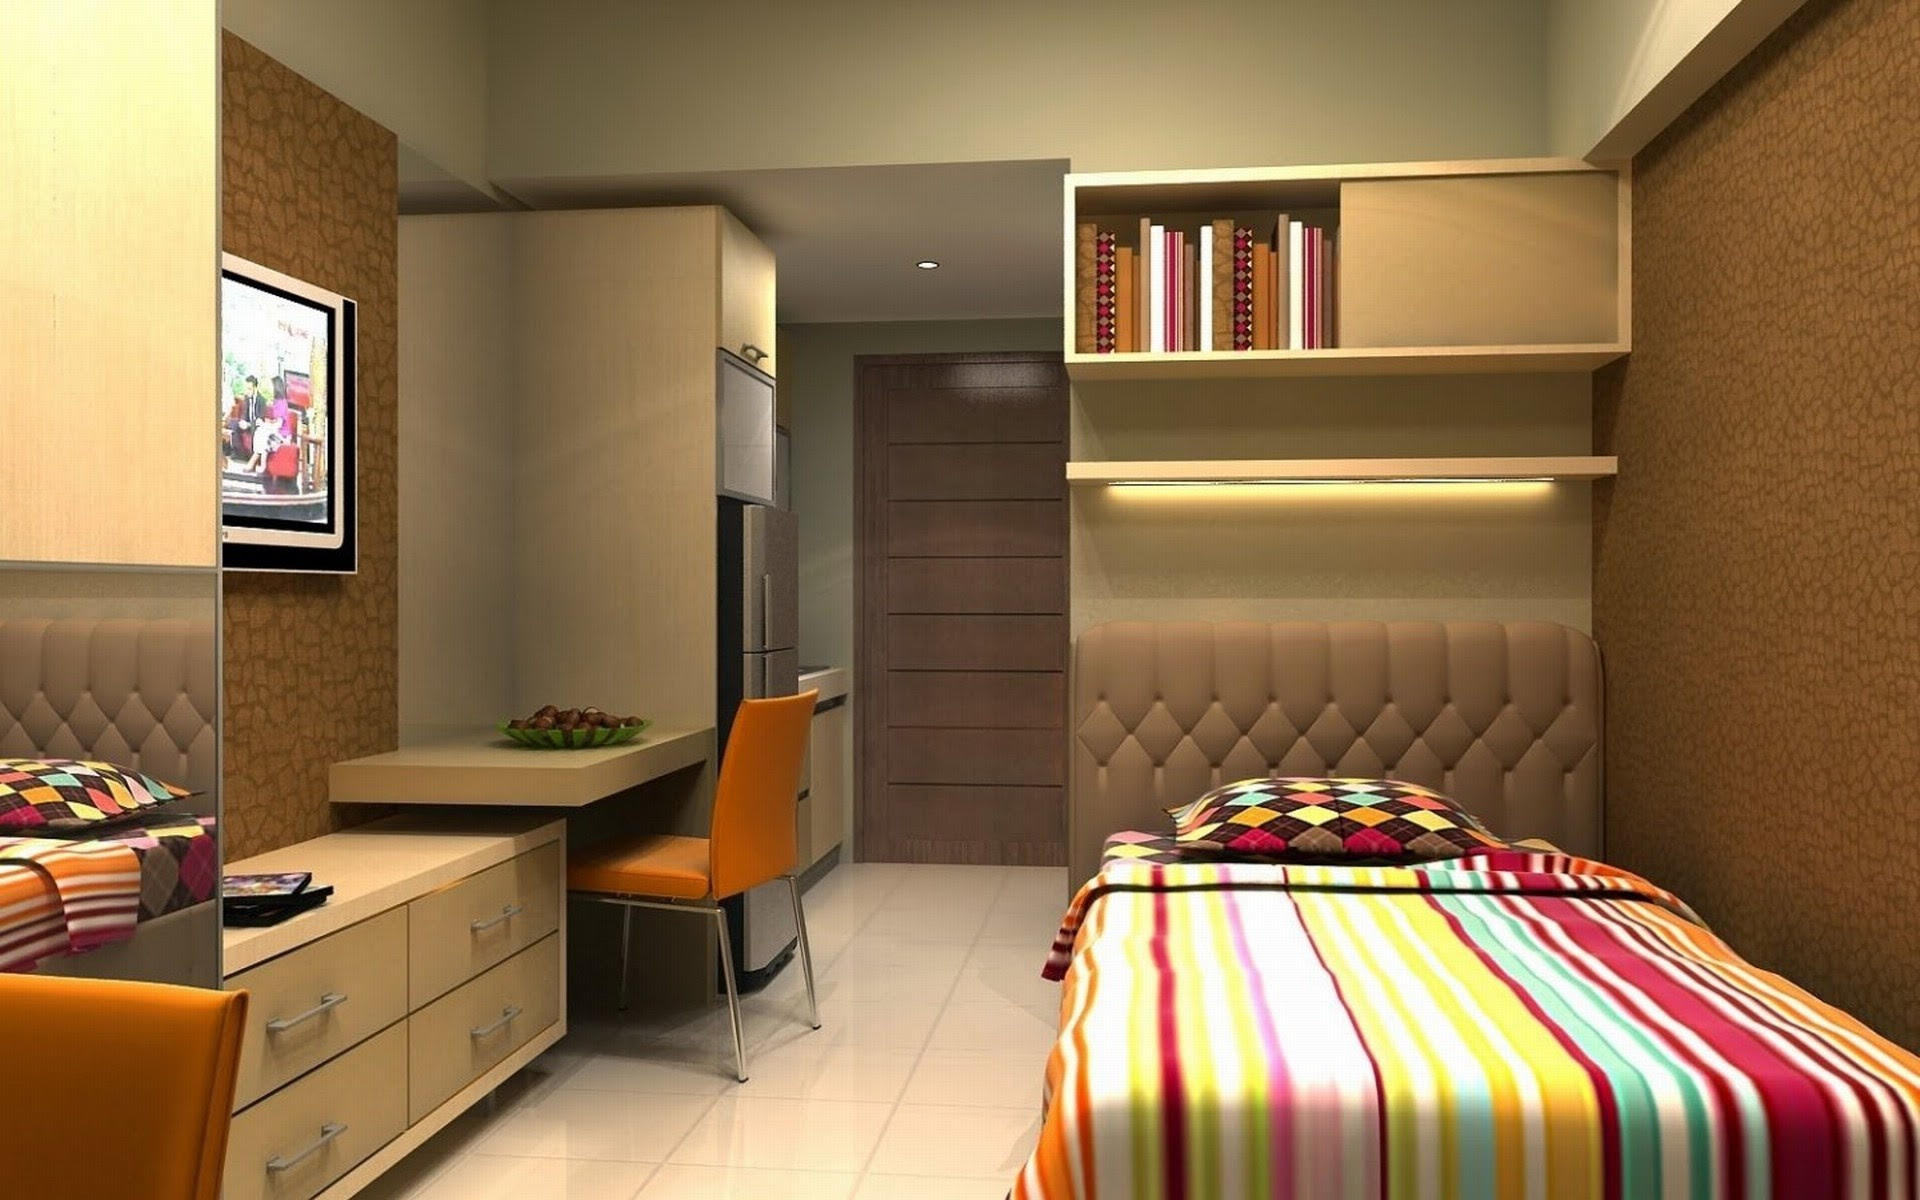 Timeless Modern Home Interior Furniture Design by Closet ...